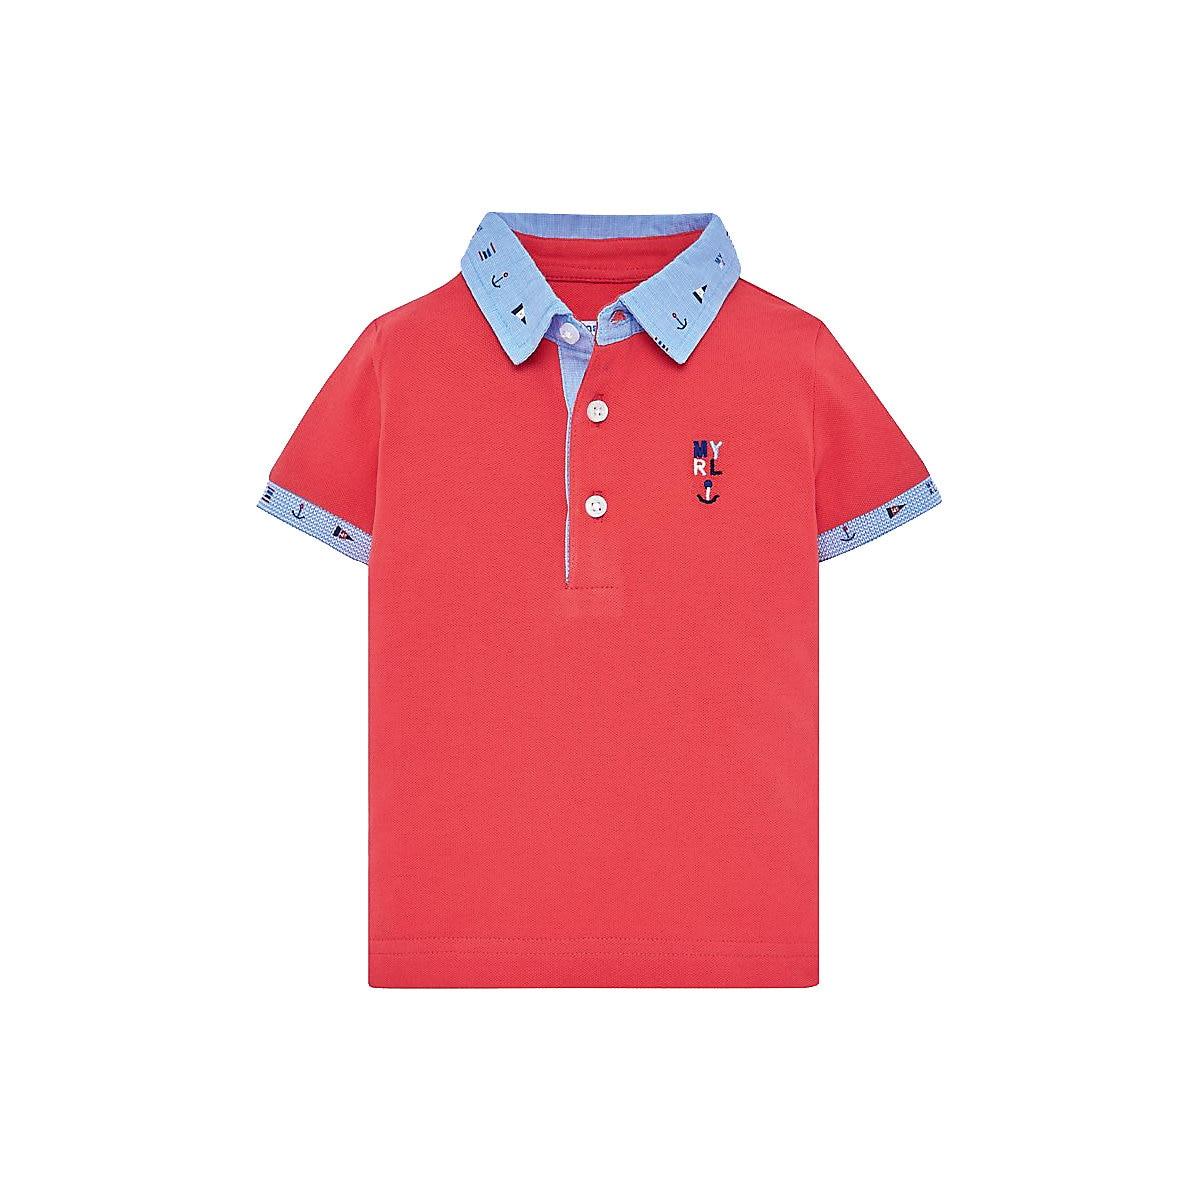 MAYORAL Polo Shirts 10693295 Children Clothing T-shirt Shirt The Print For Boys